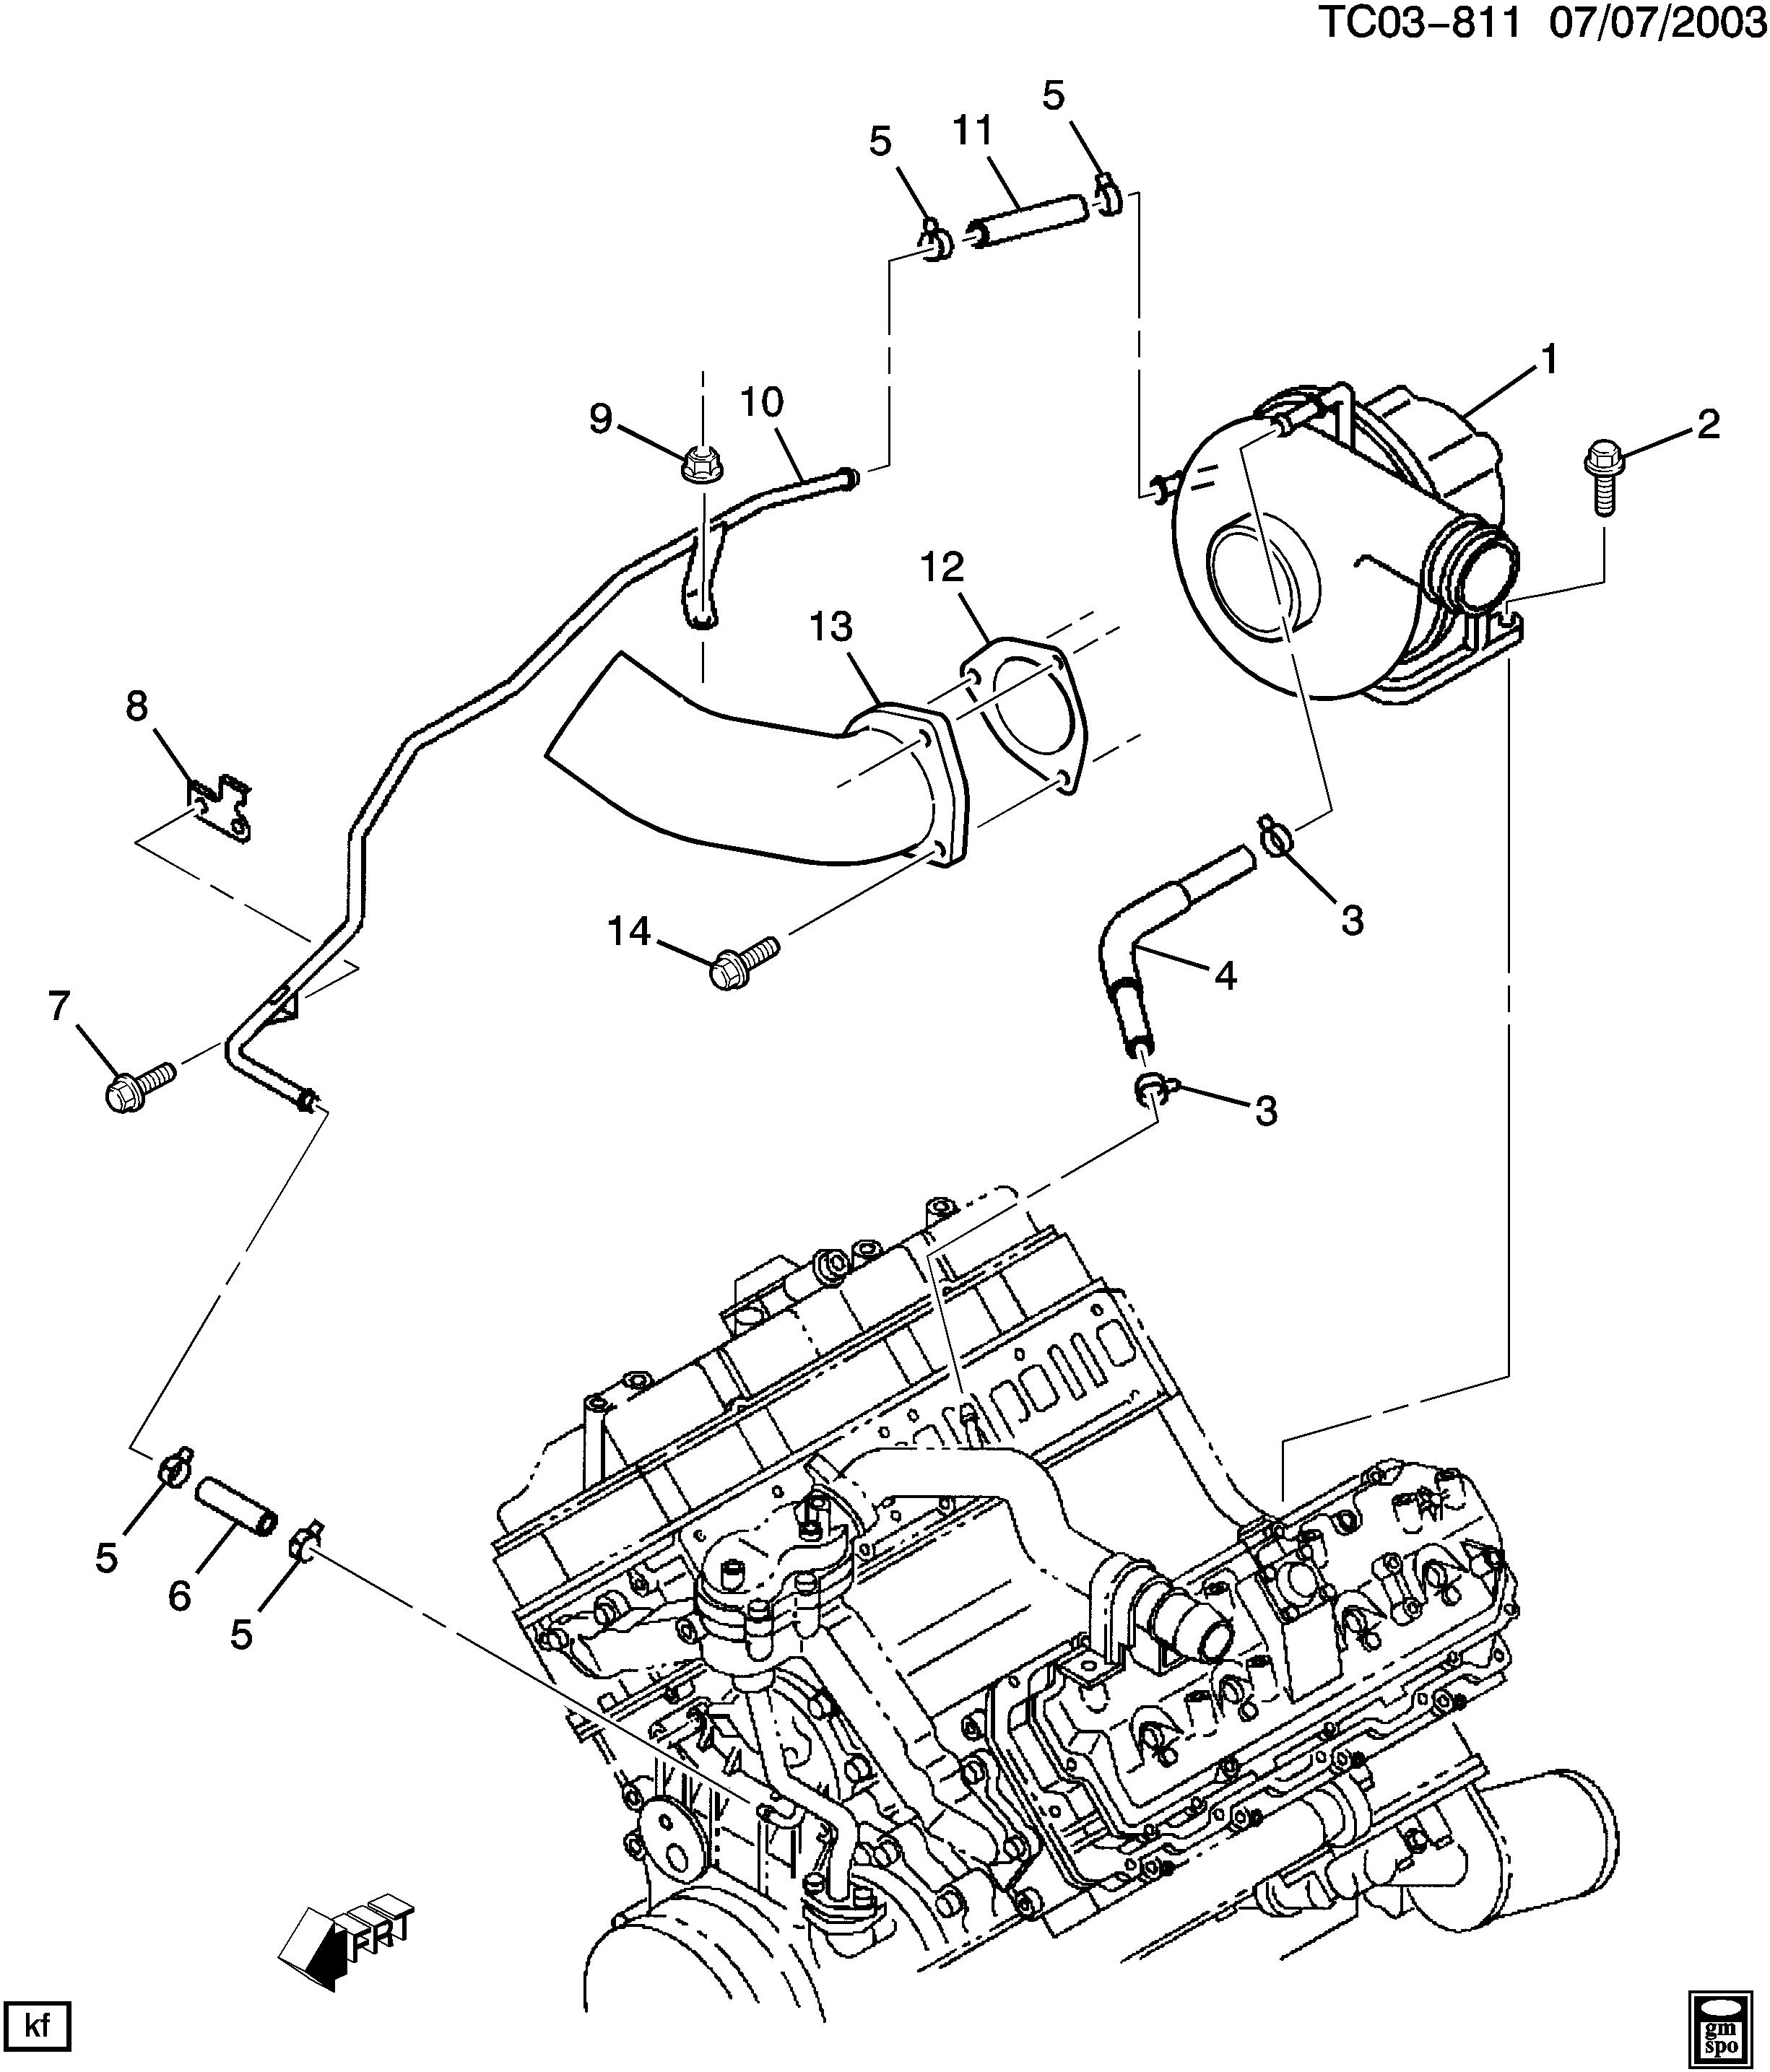 AVALANCHE 1500 2WD - Turbocharger cooling system > Chevrolet ... on lb7 turbo coolant hose, lb7 return line diagram, lb7 duramax,